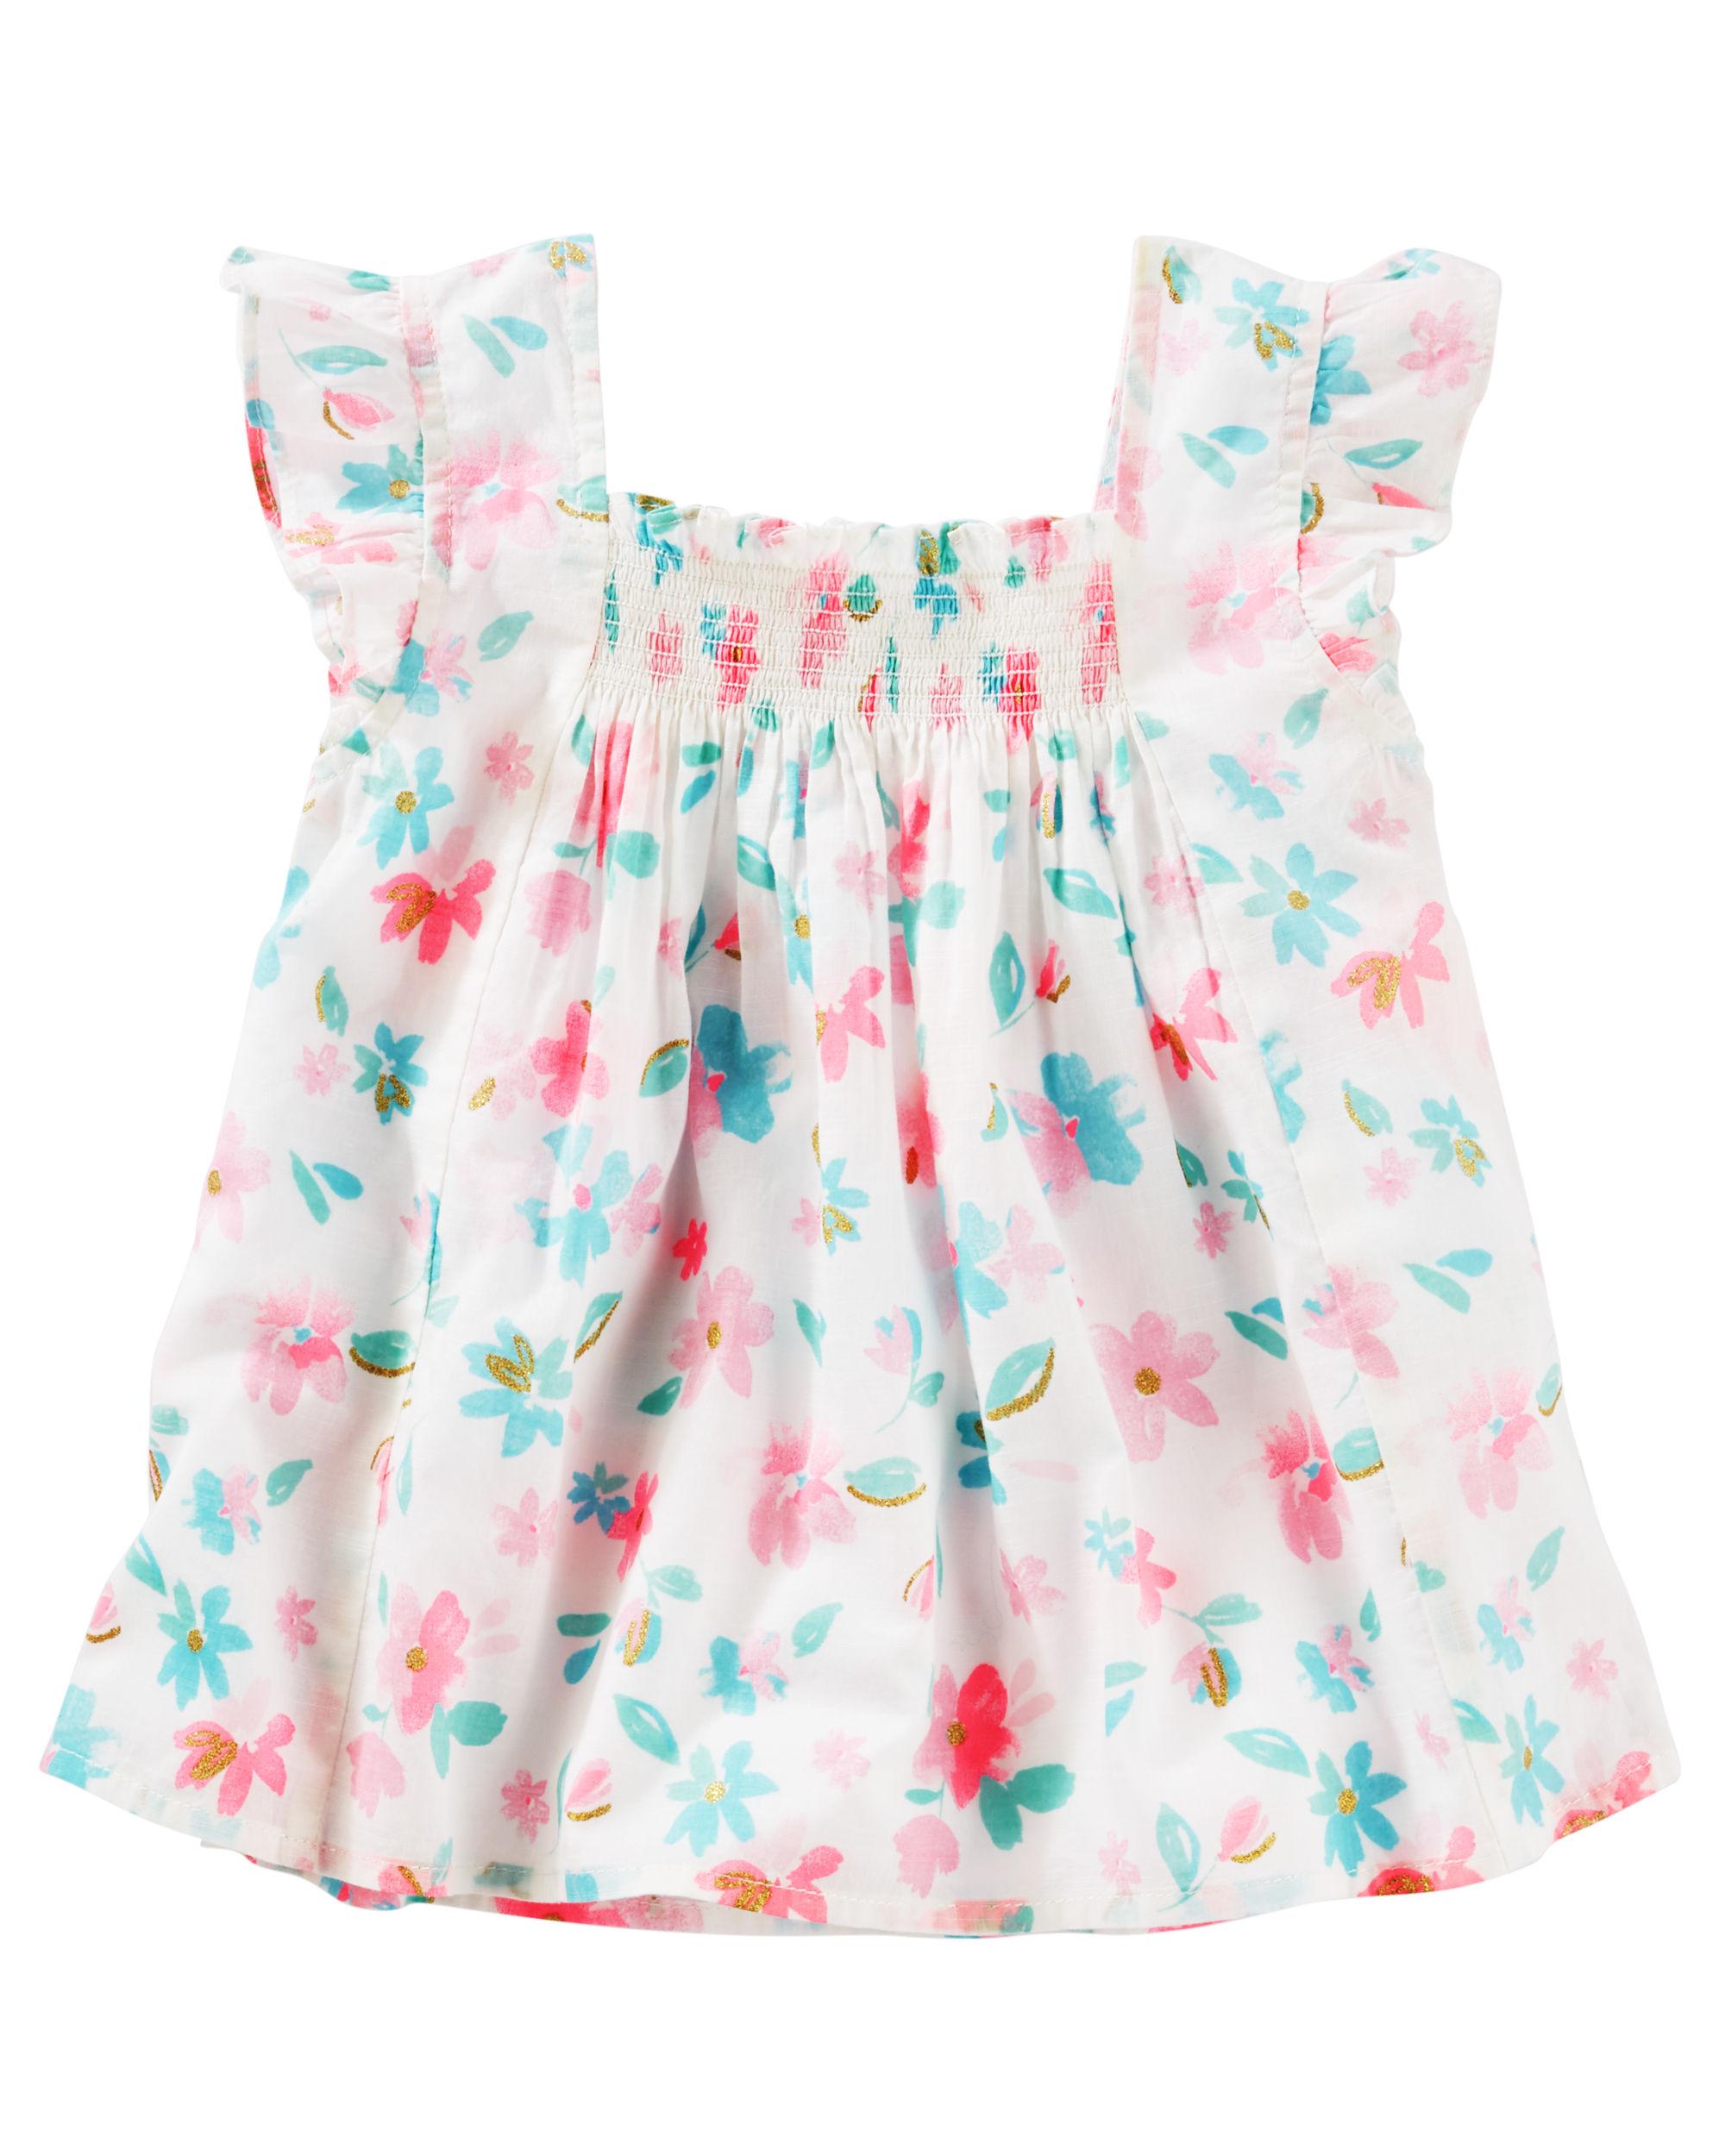 OshKosh B'gosh Big Girls' Smocked Floral Top, 7-Kids